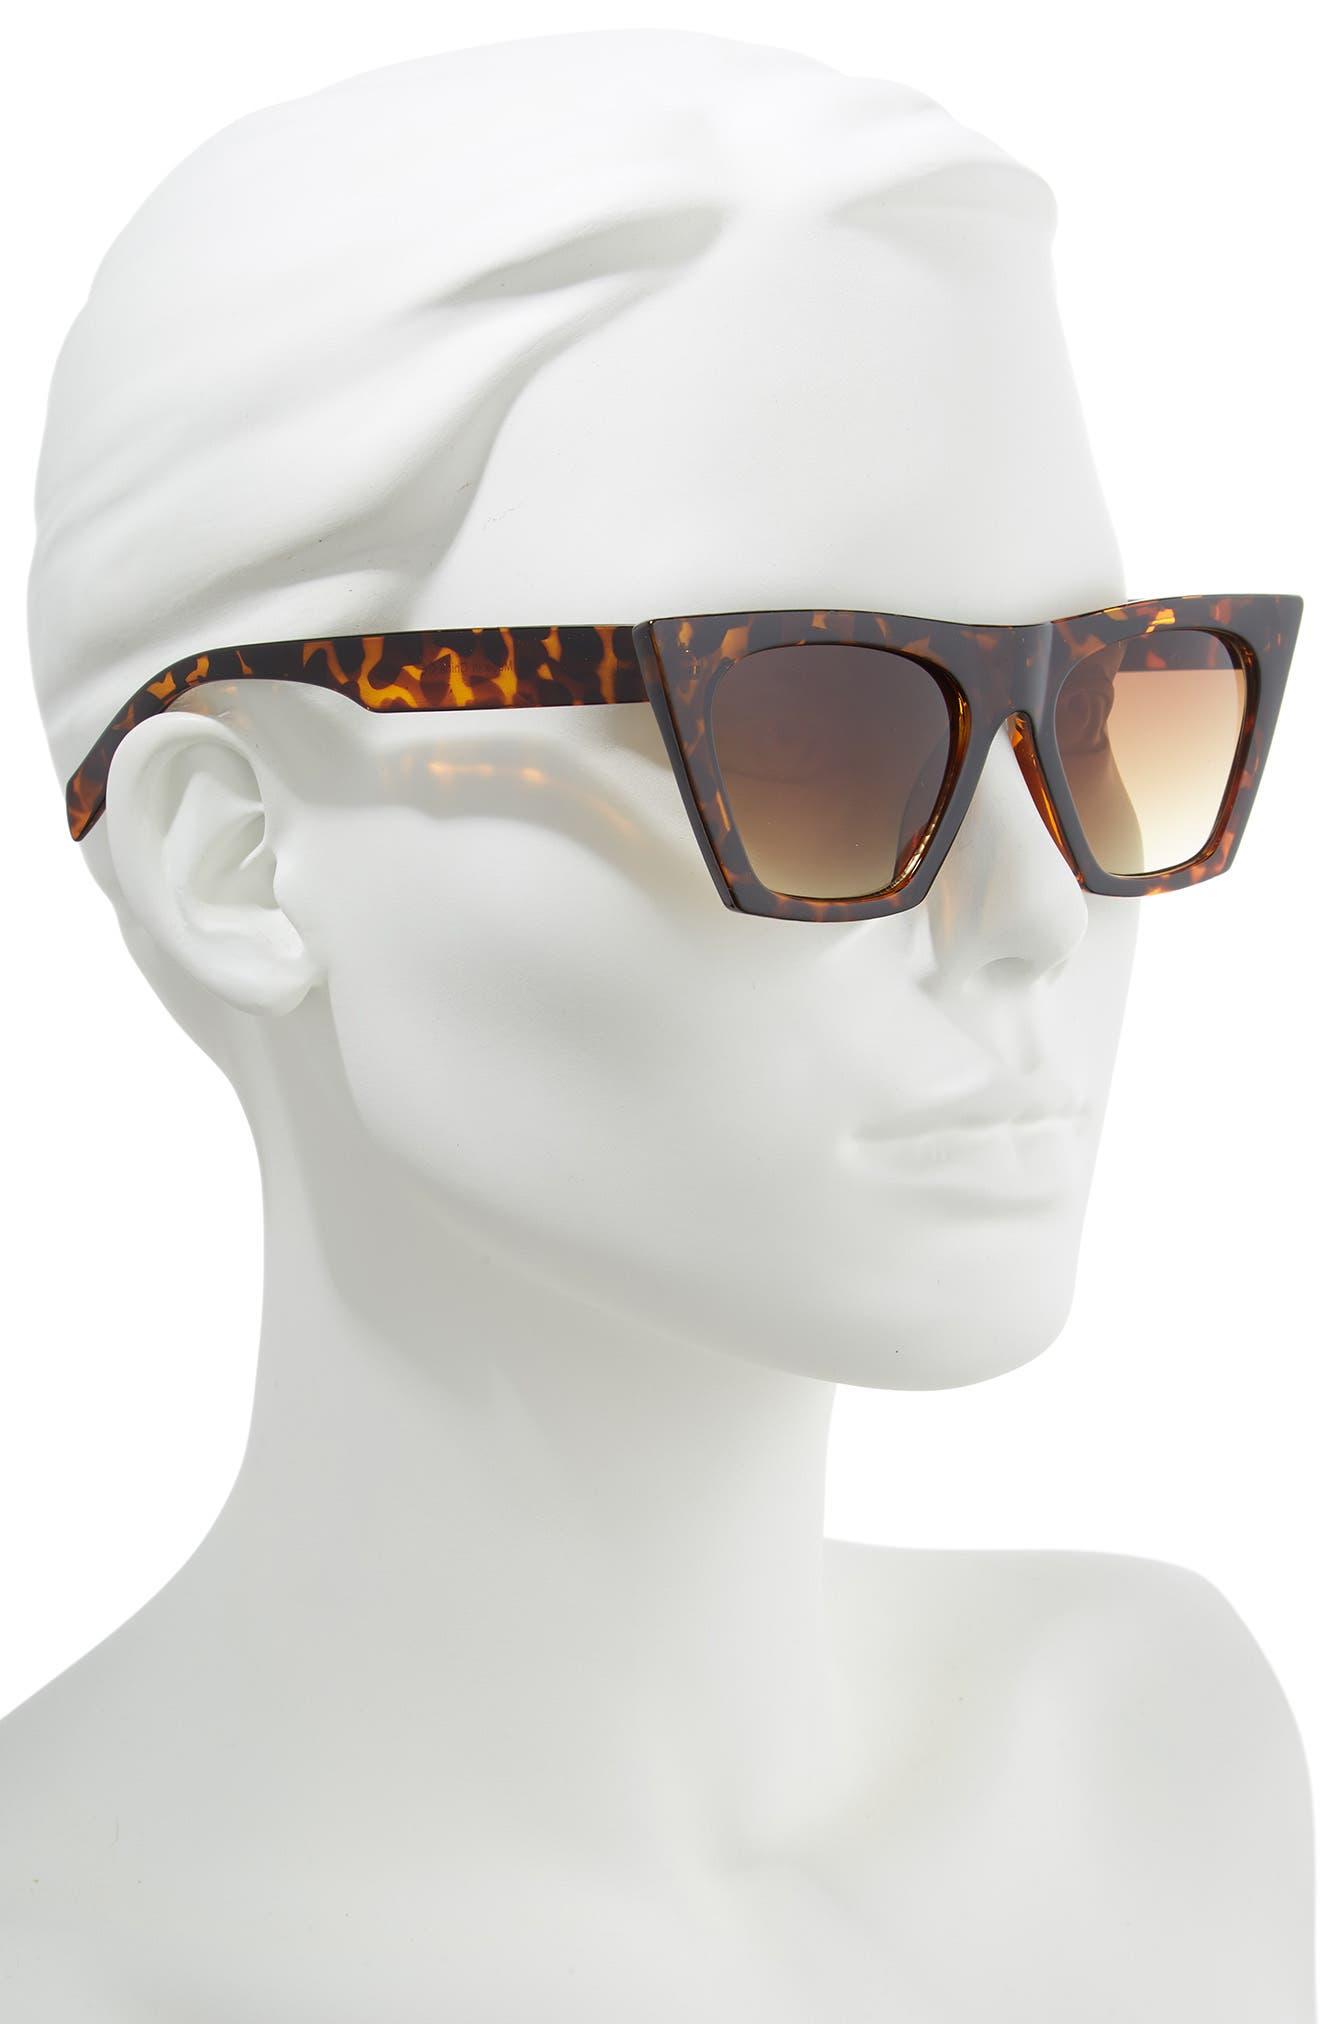 50mm Cat Eye Sunglasses,                             Alternate thumbnail 2, color,                             BROWN MULTI